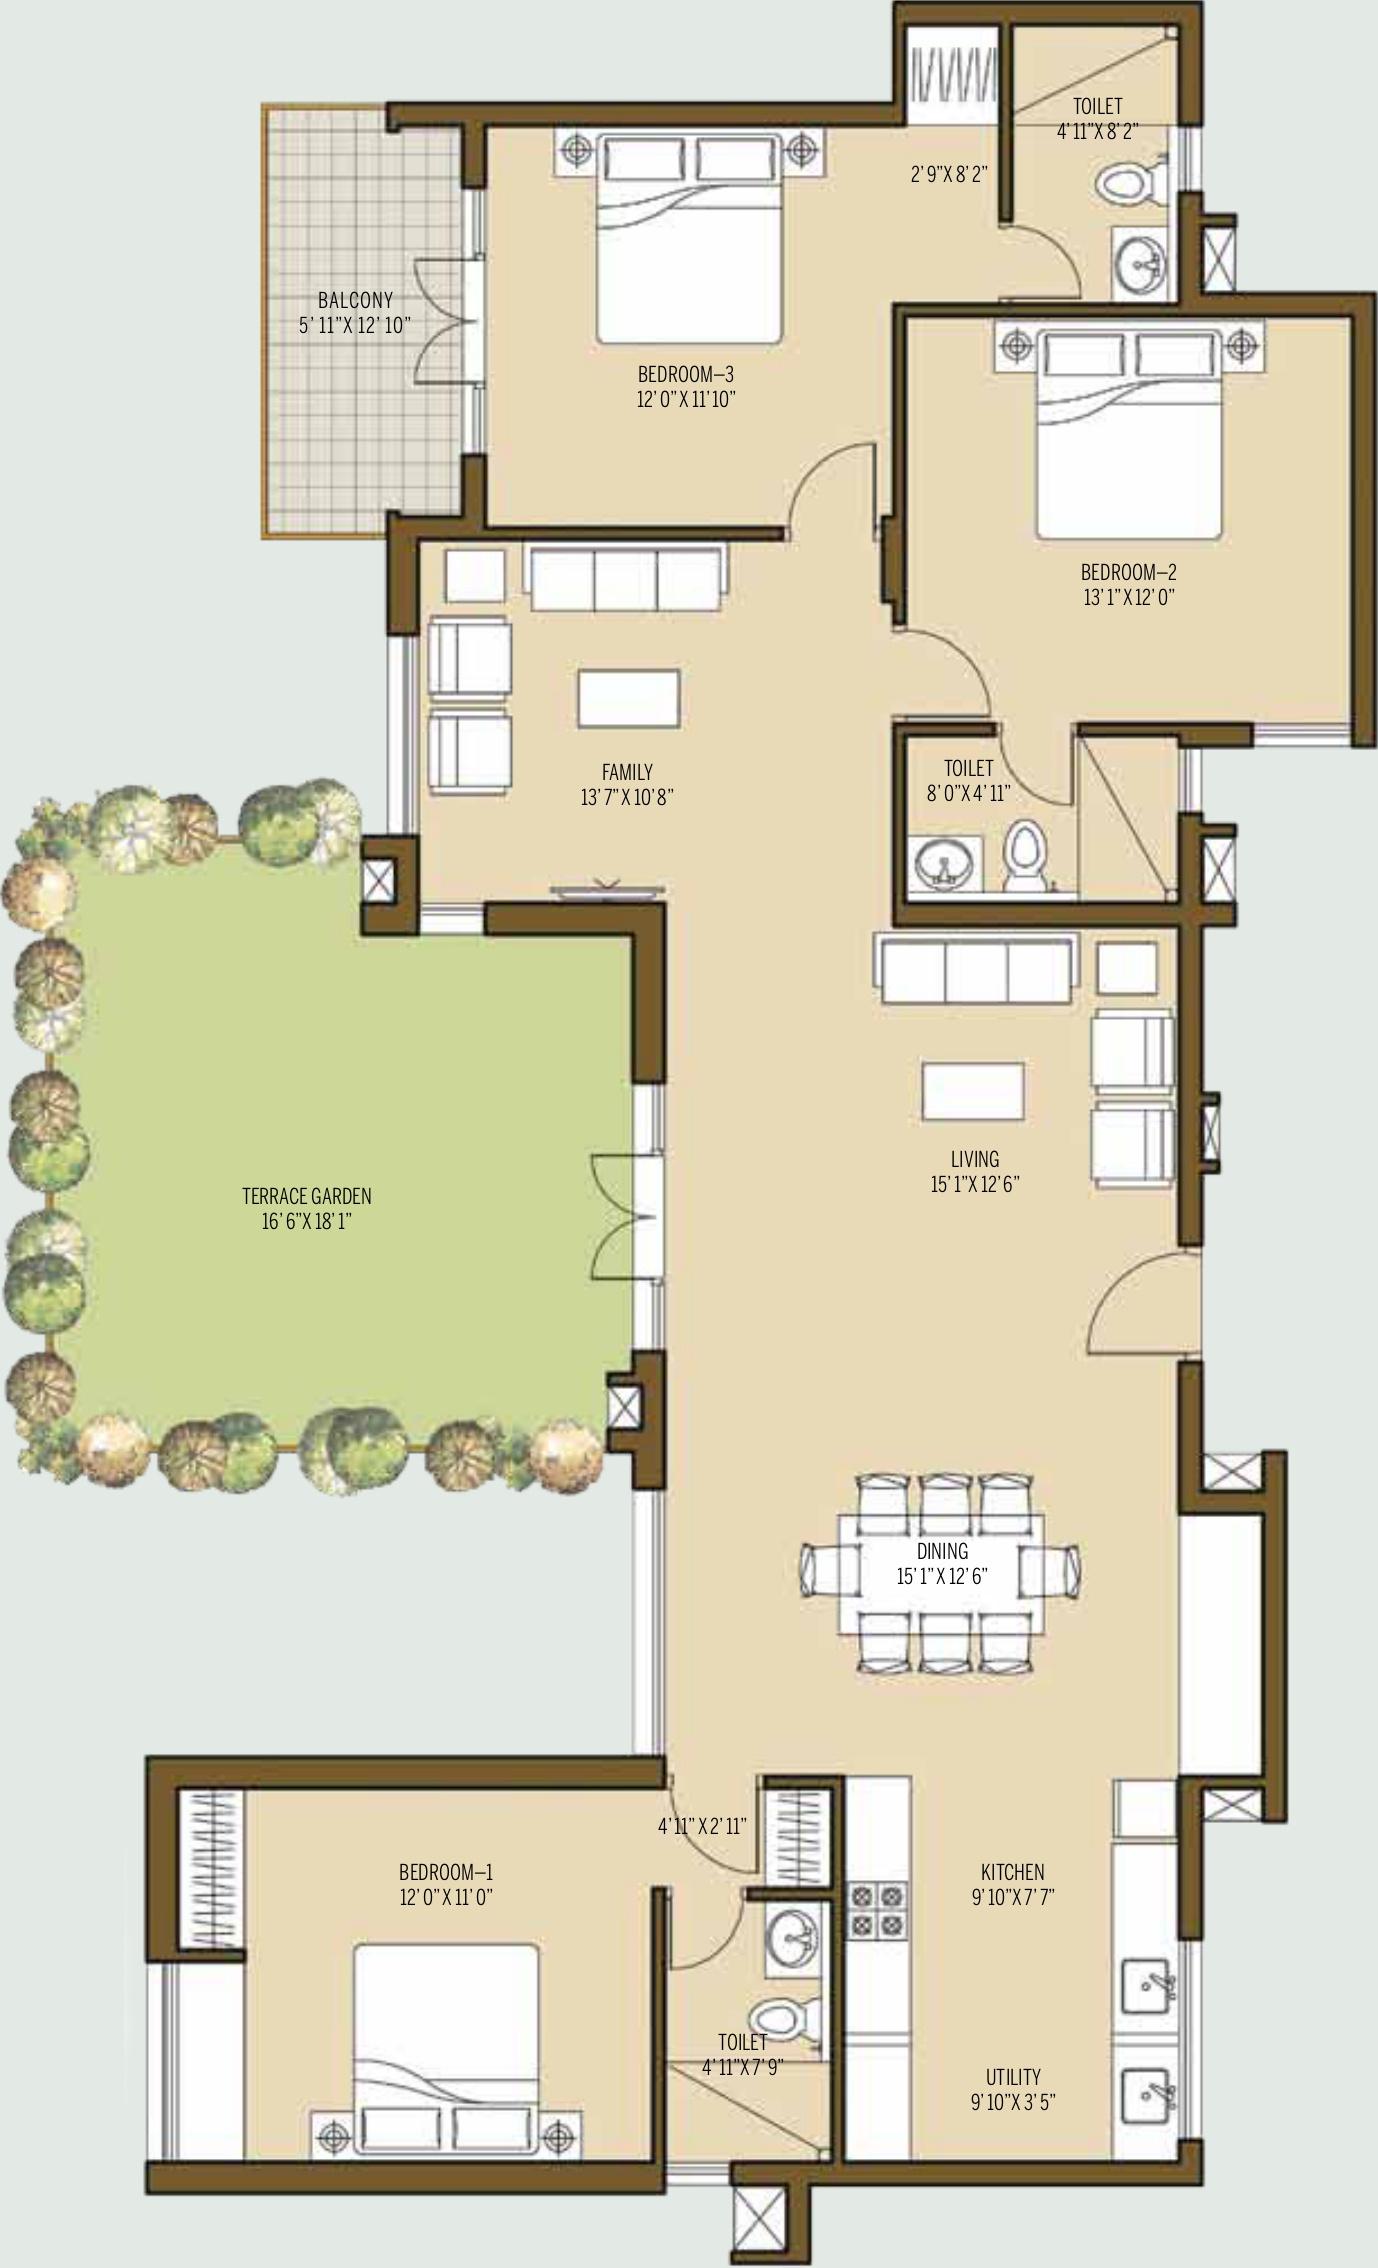 Good Malhar Terraces In Kumbalgodu Bangalore Price